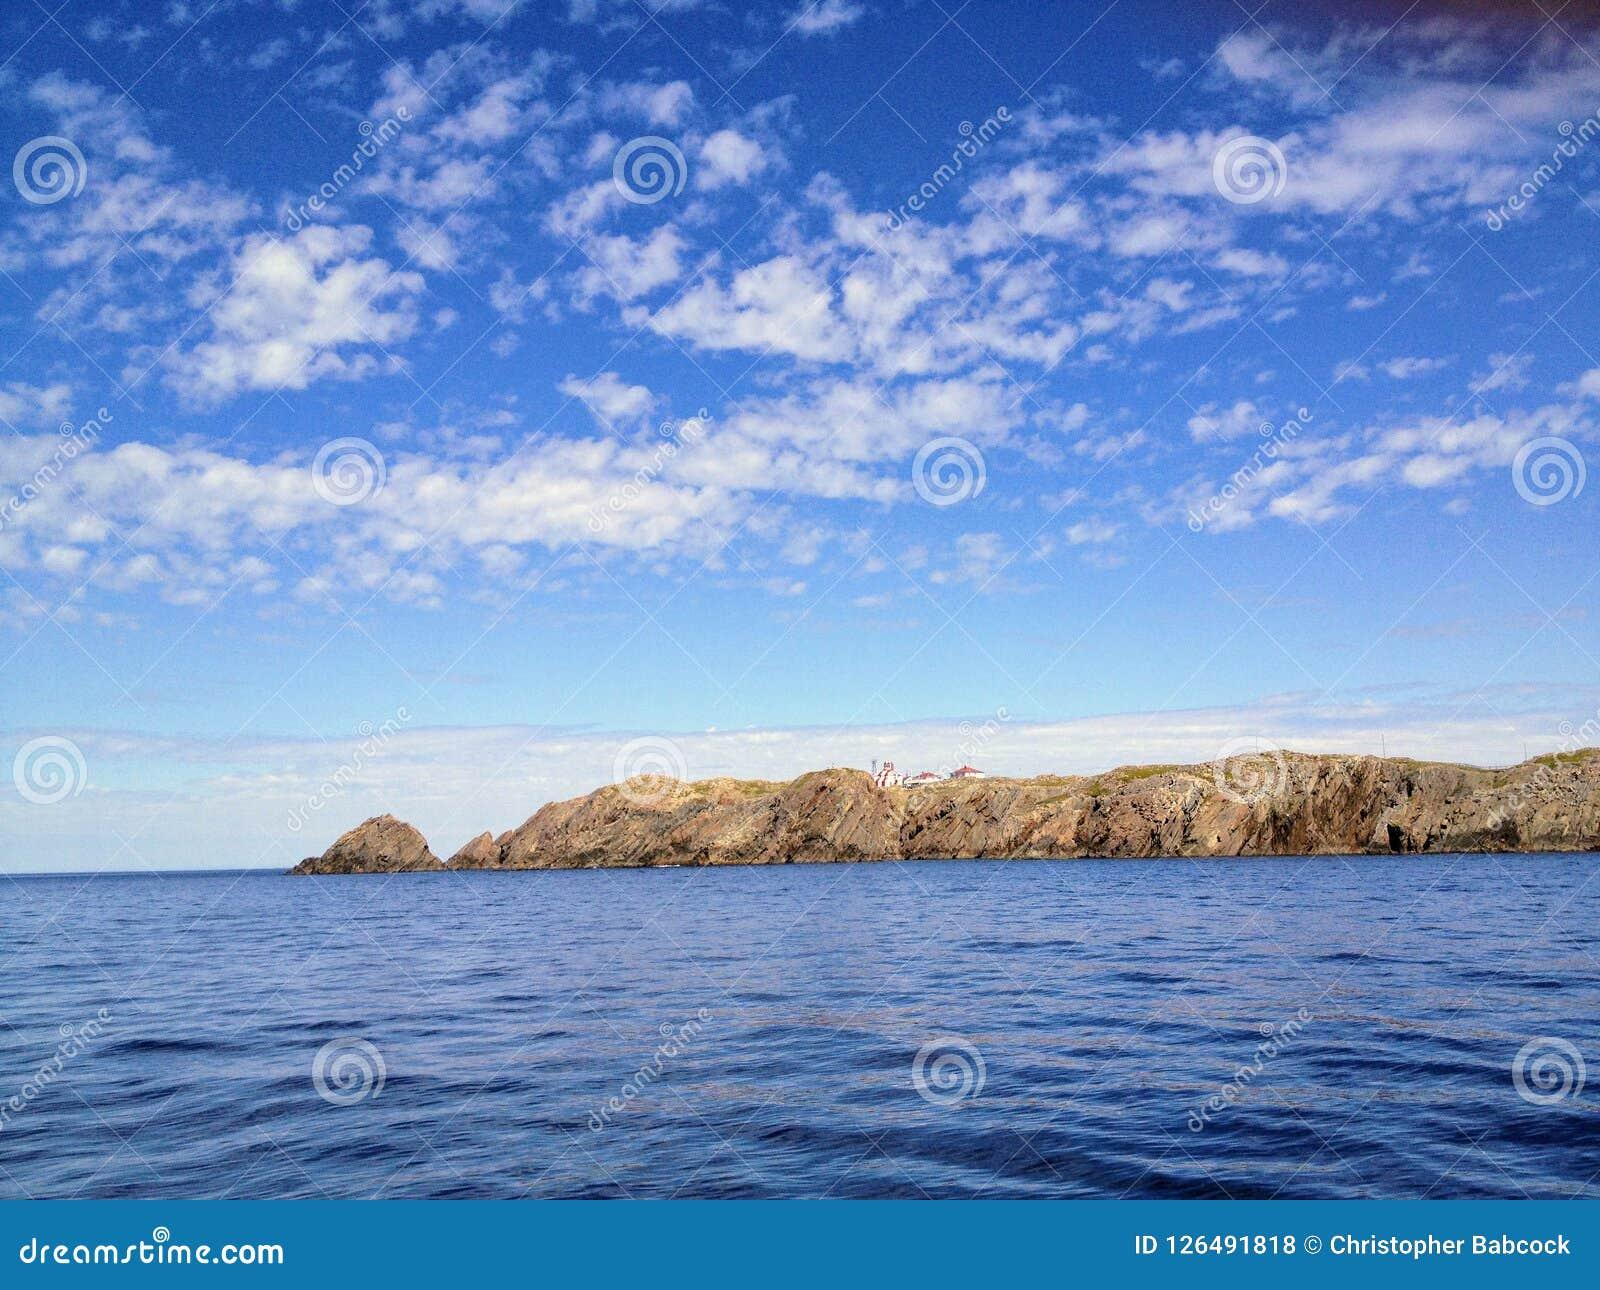 Admiring the beautiful ocean vistas off the coast of Bonavista,